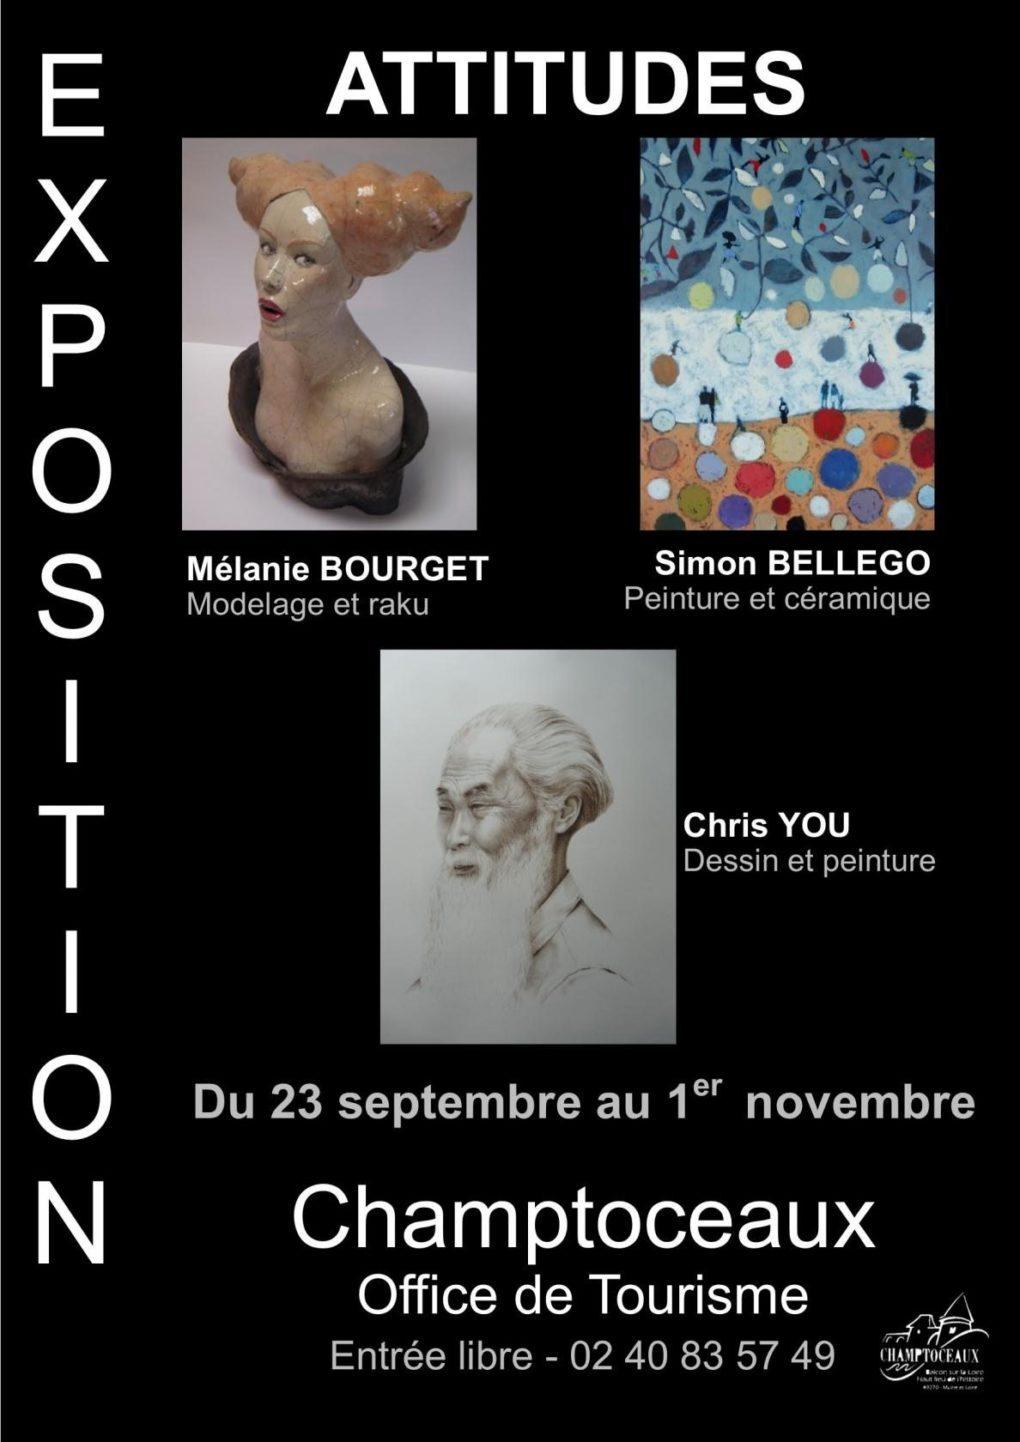 Exposition Attitudes Orée-d'Anjou